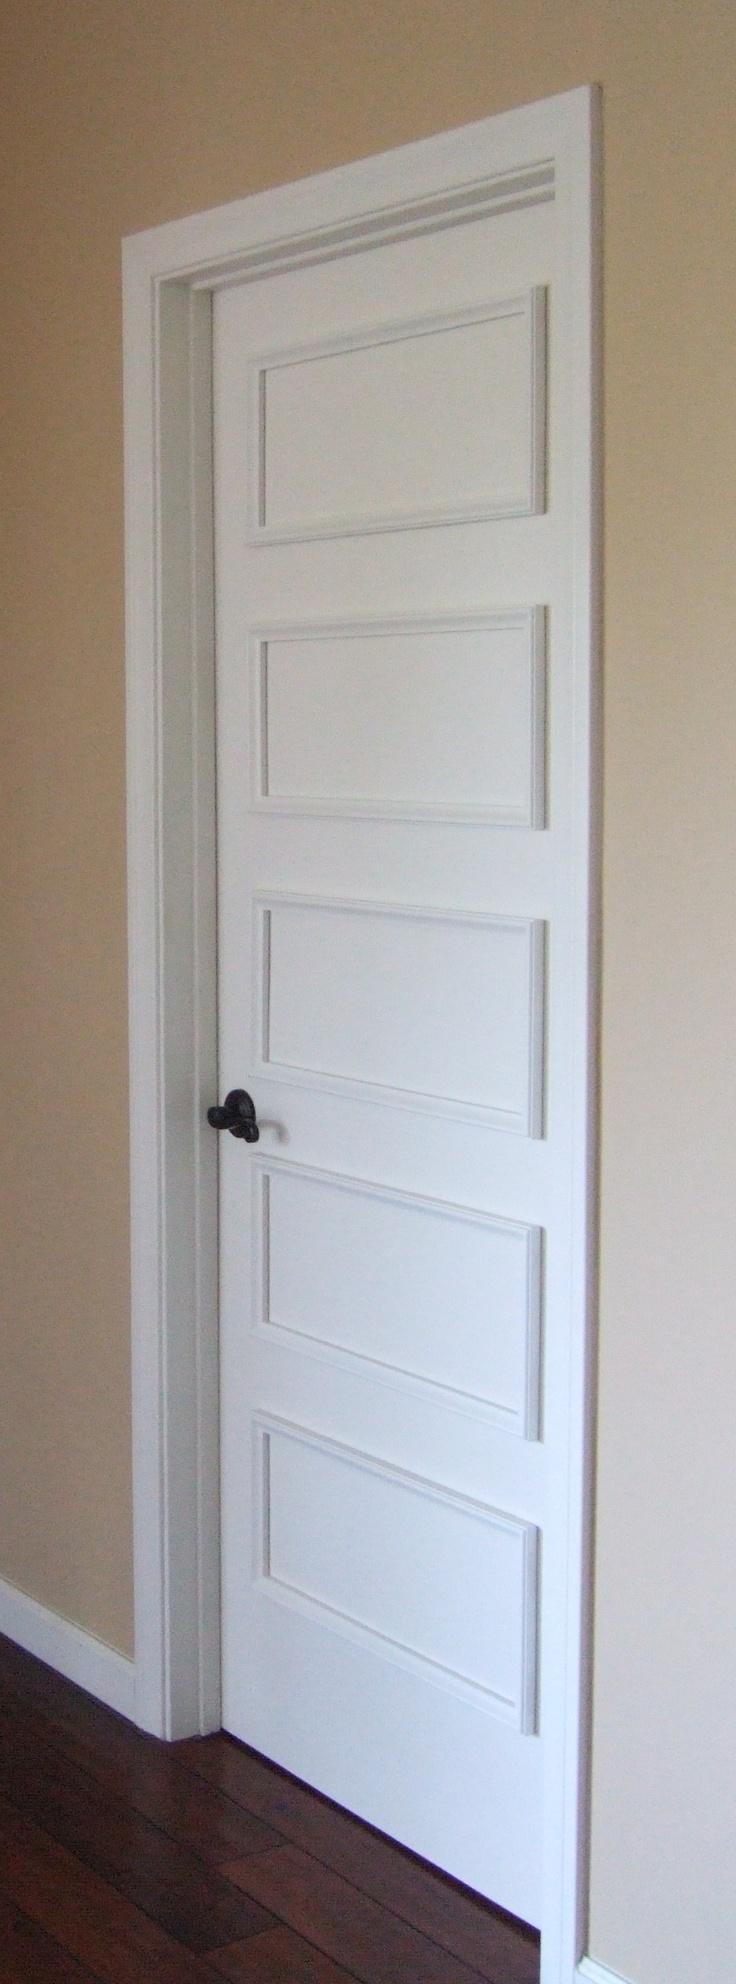 10 best images about door moulding kits on pinterest for 10 panel door